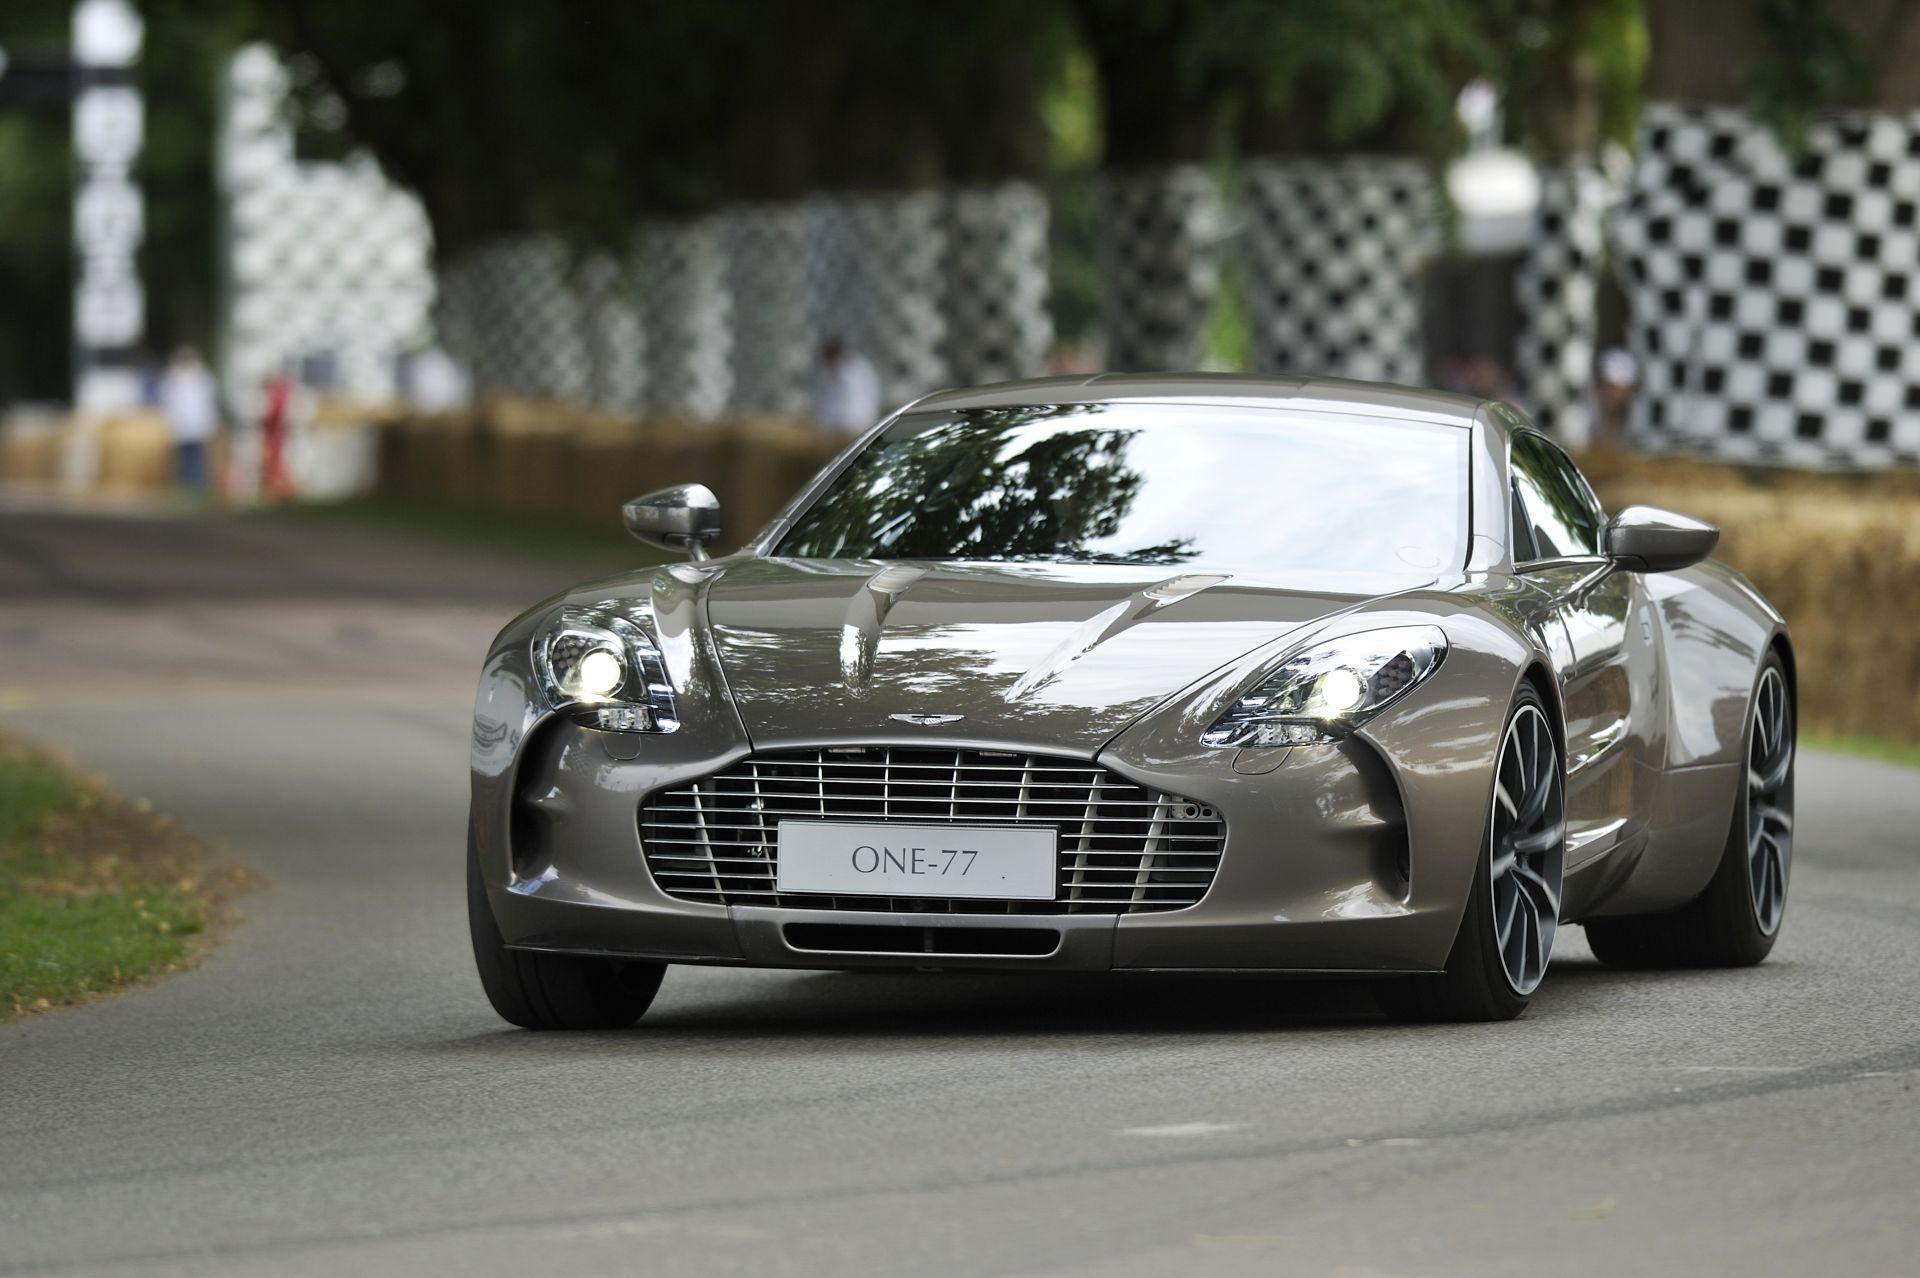 Aston Martin legt Elektroauto-Pläne auf Eis